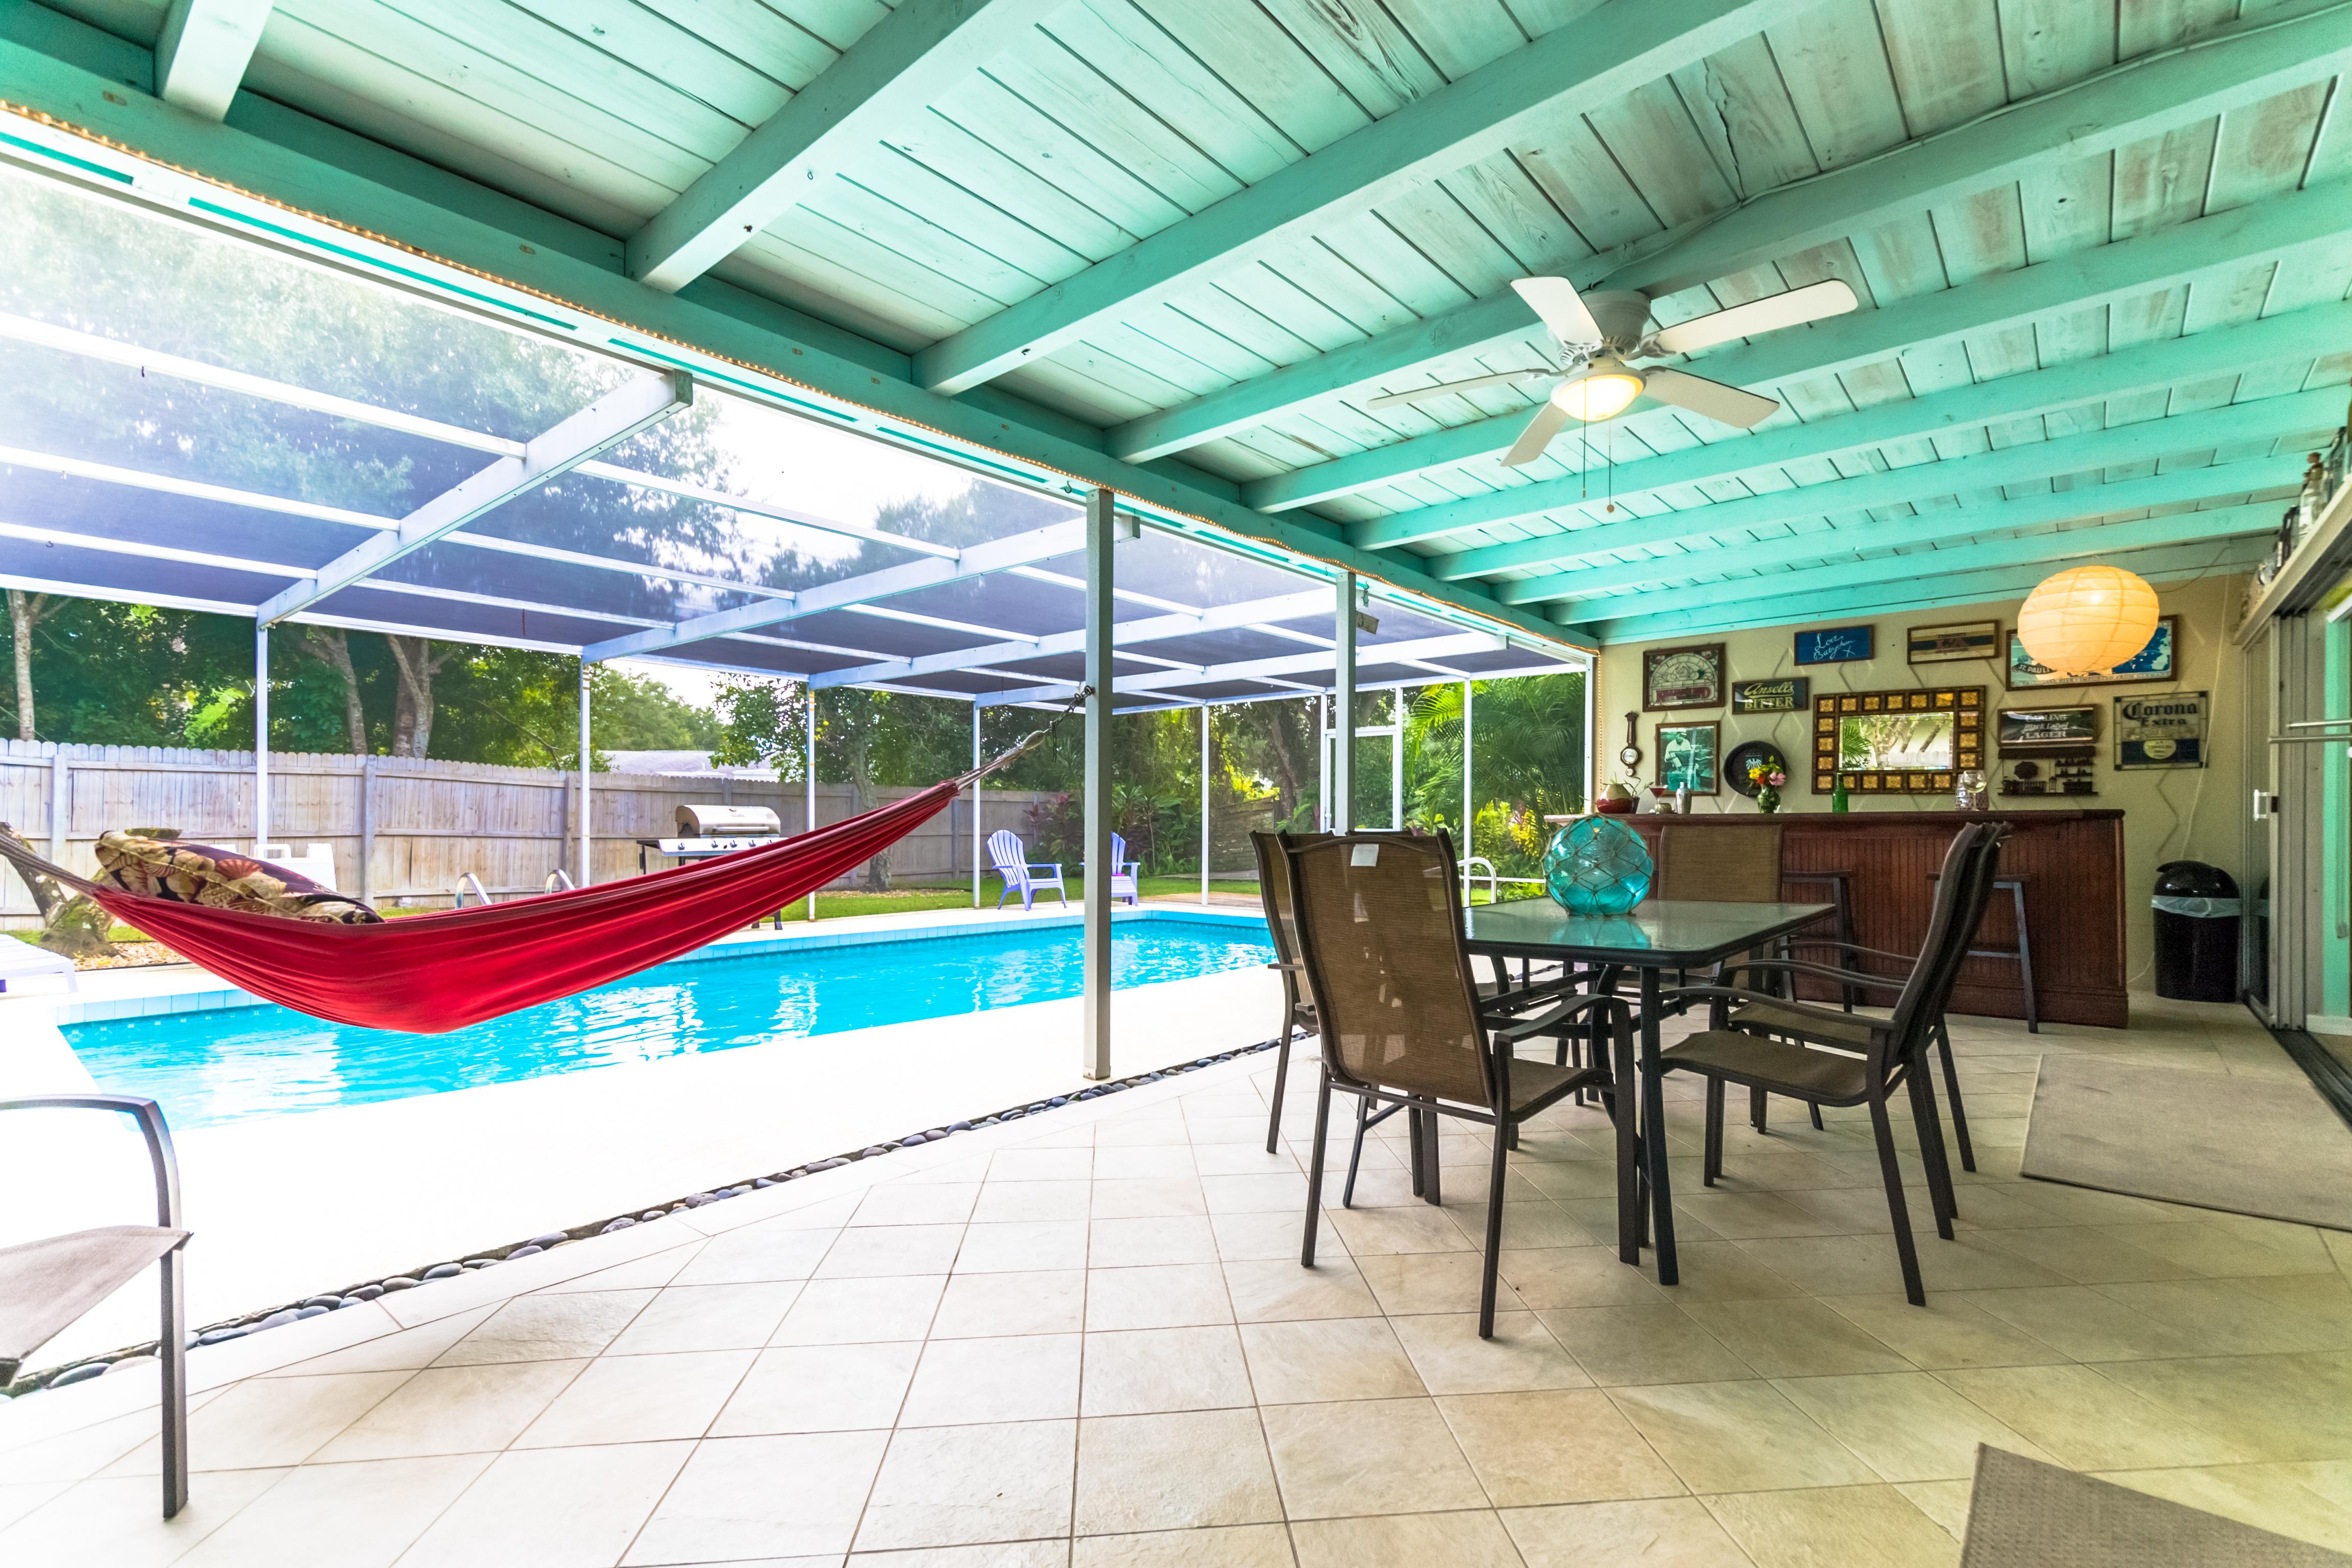 Villa espanola lovely 3 2 heated pool koi pond garden for Koi pool villa